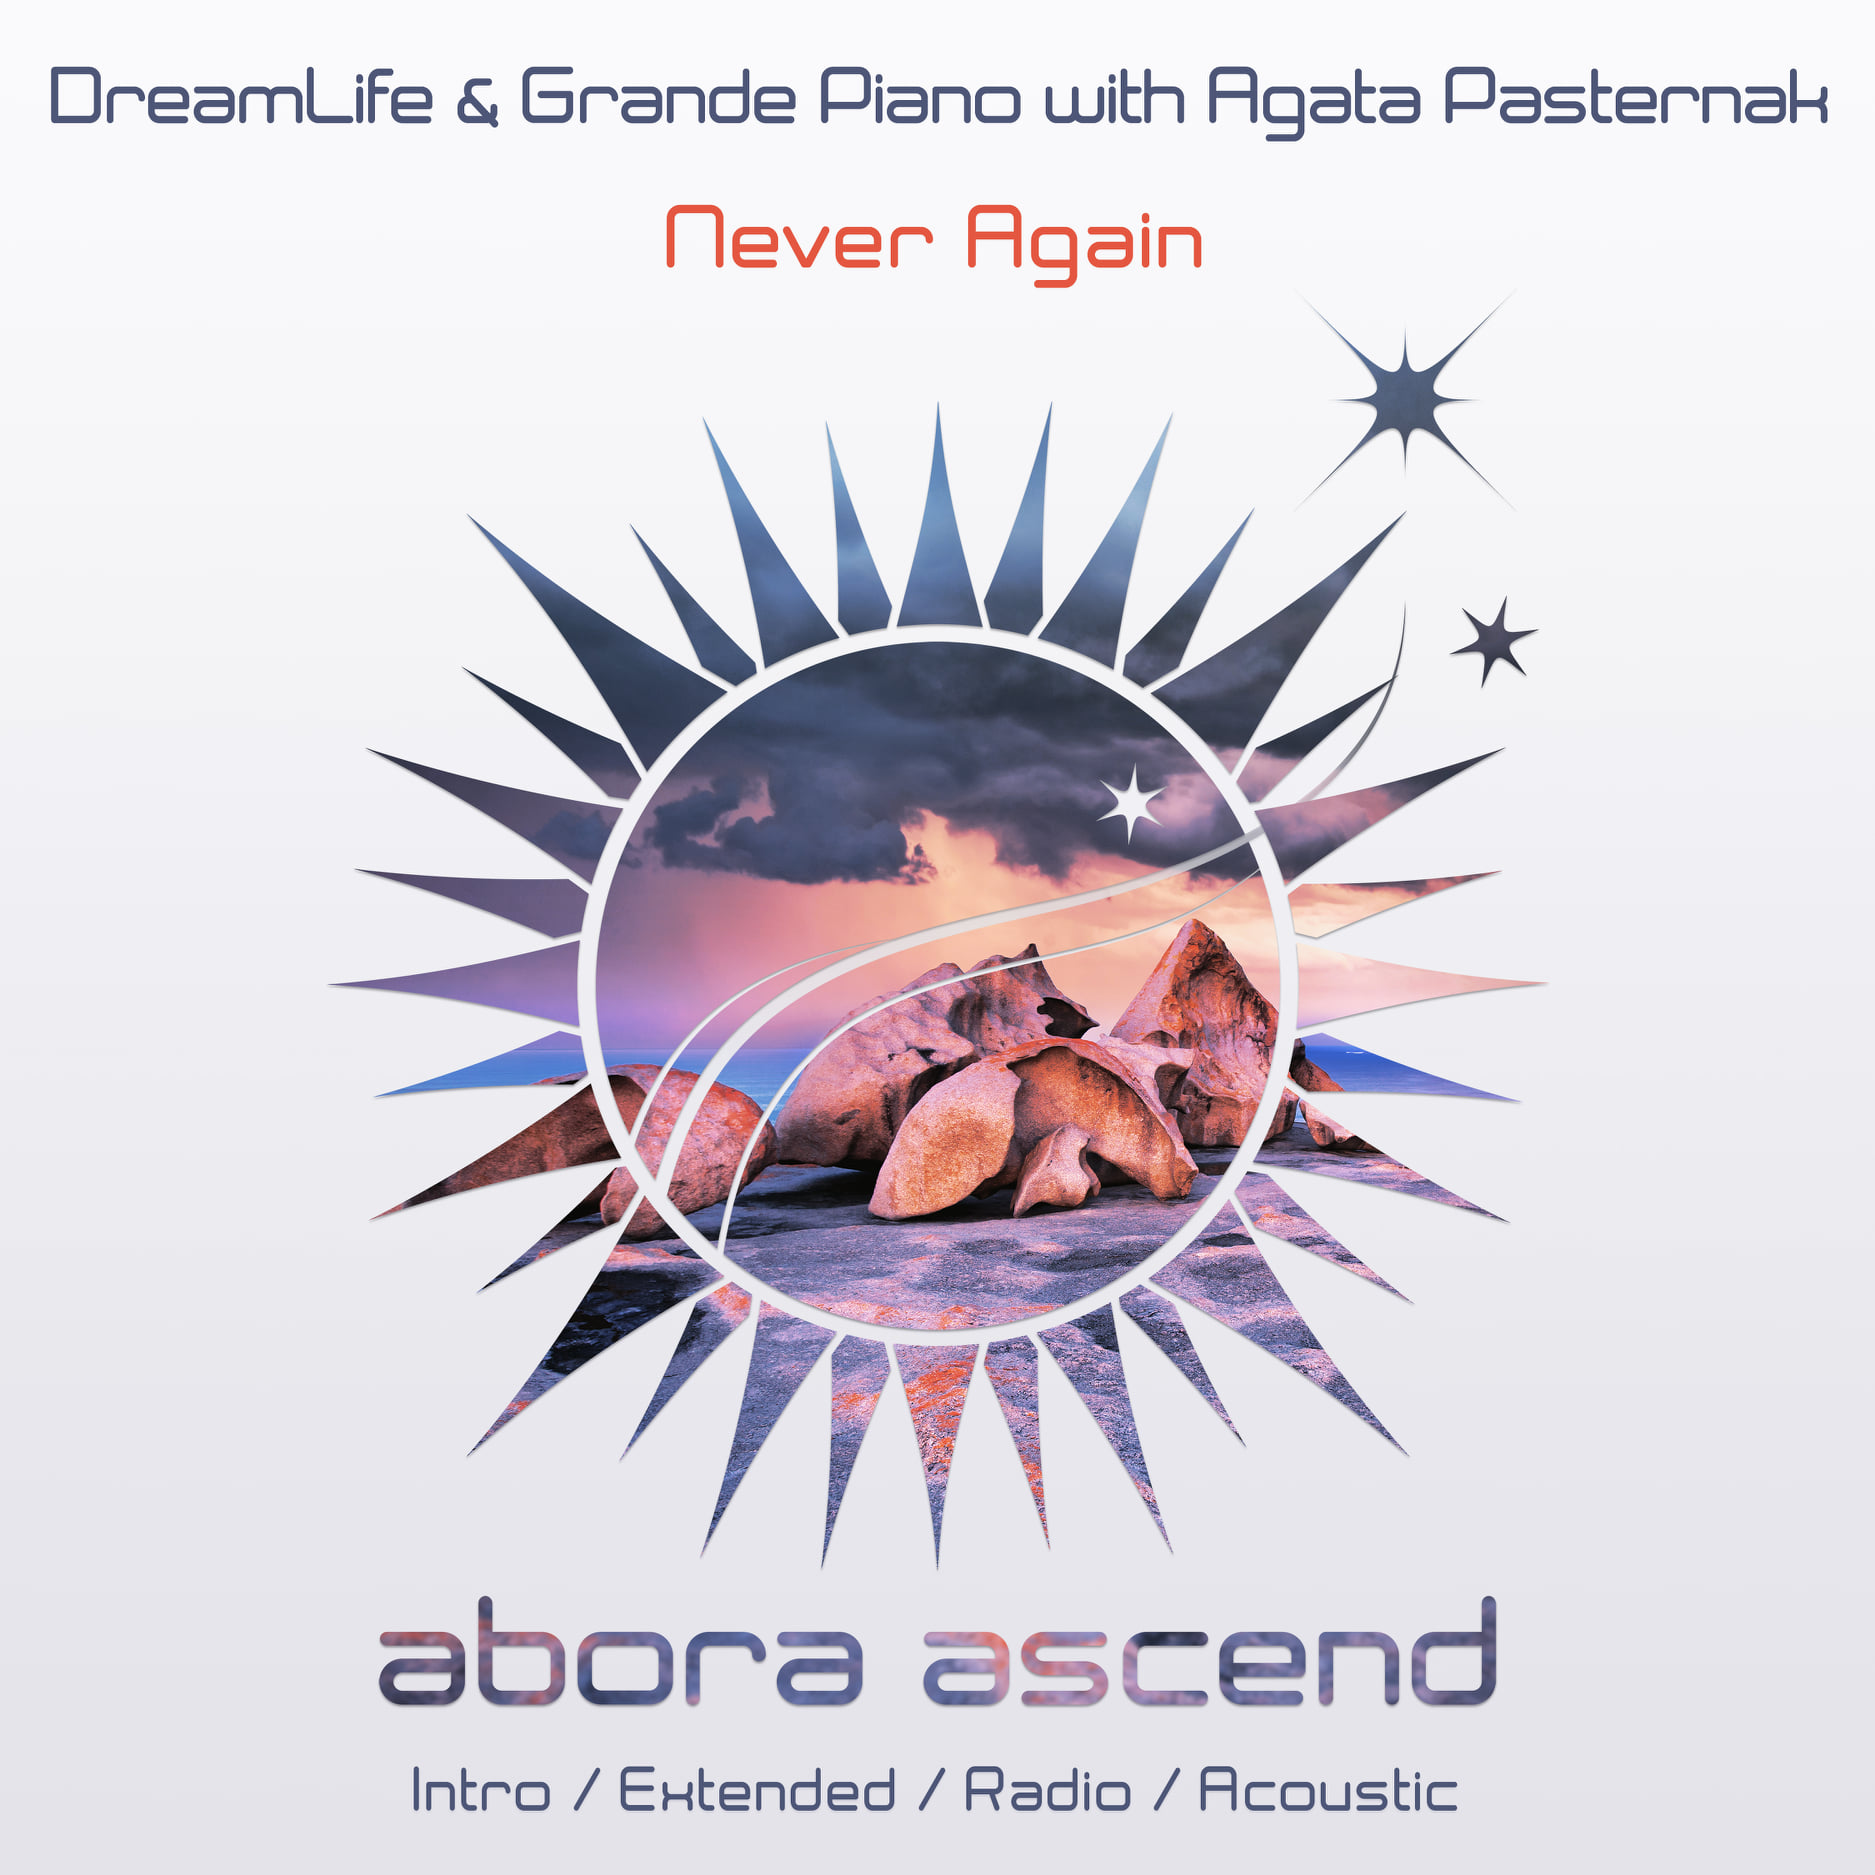 DreamLife & Grande Piano with. Agata Pasternak - Never Again